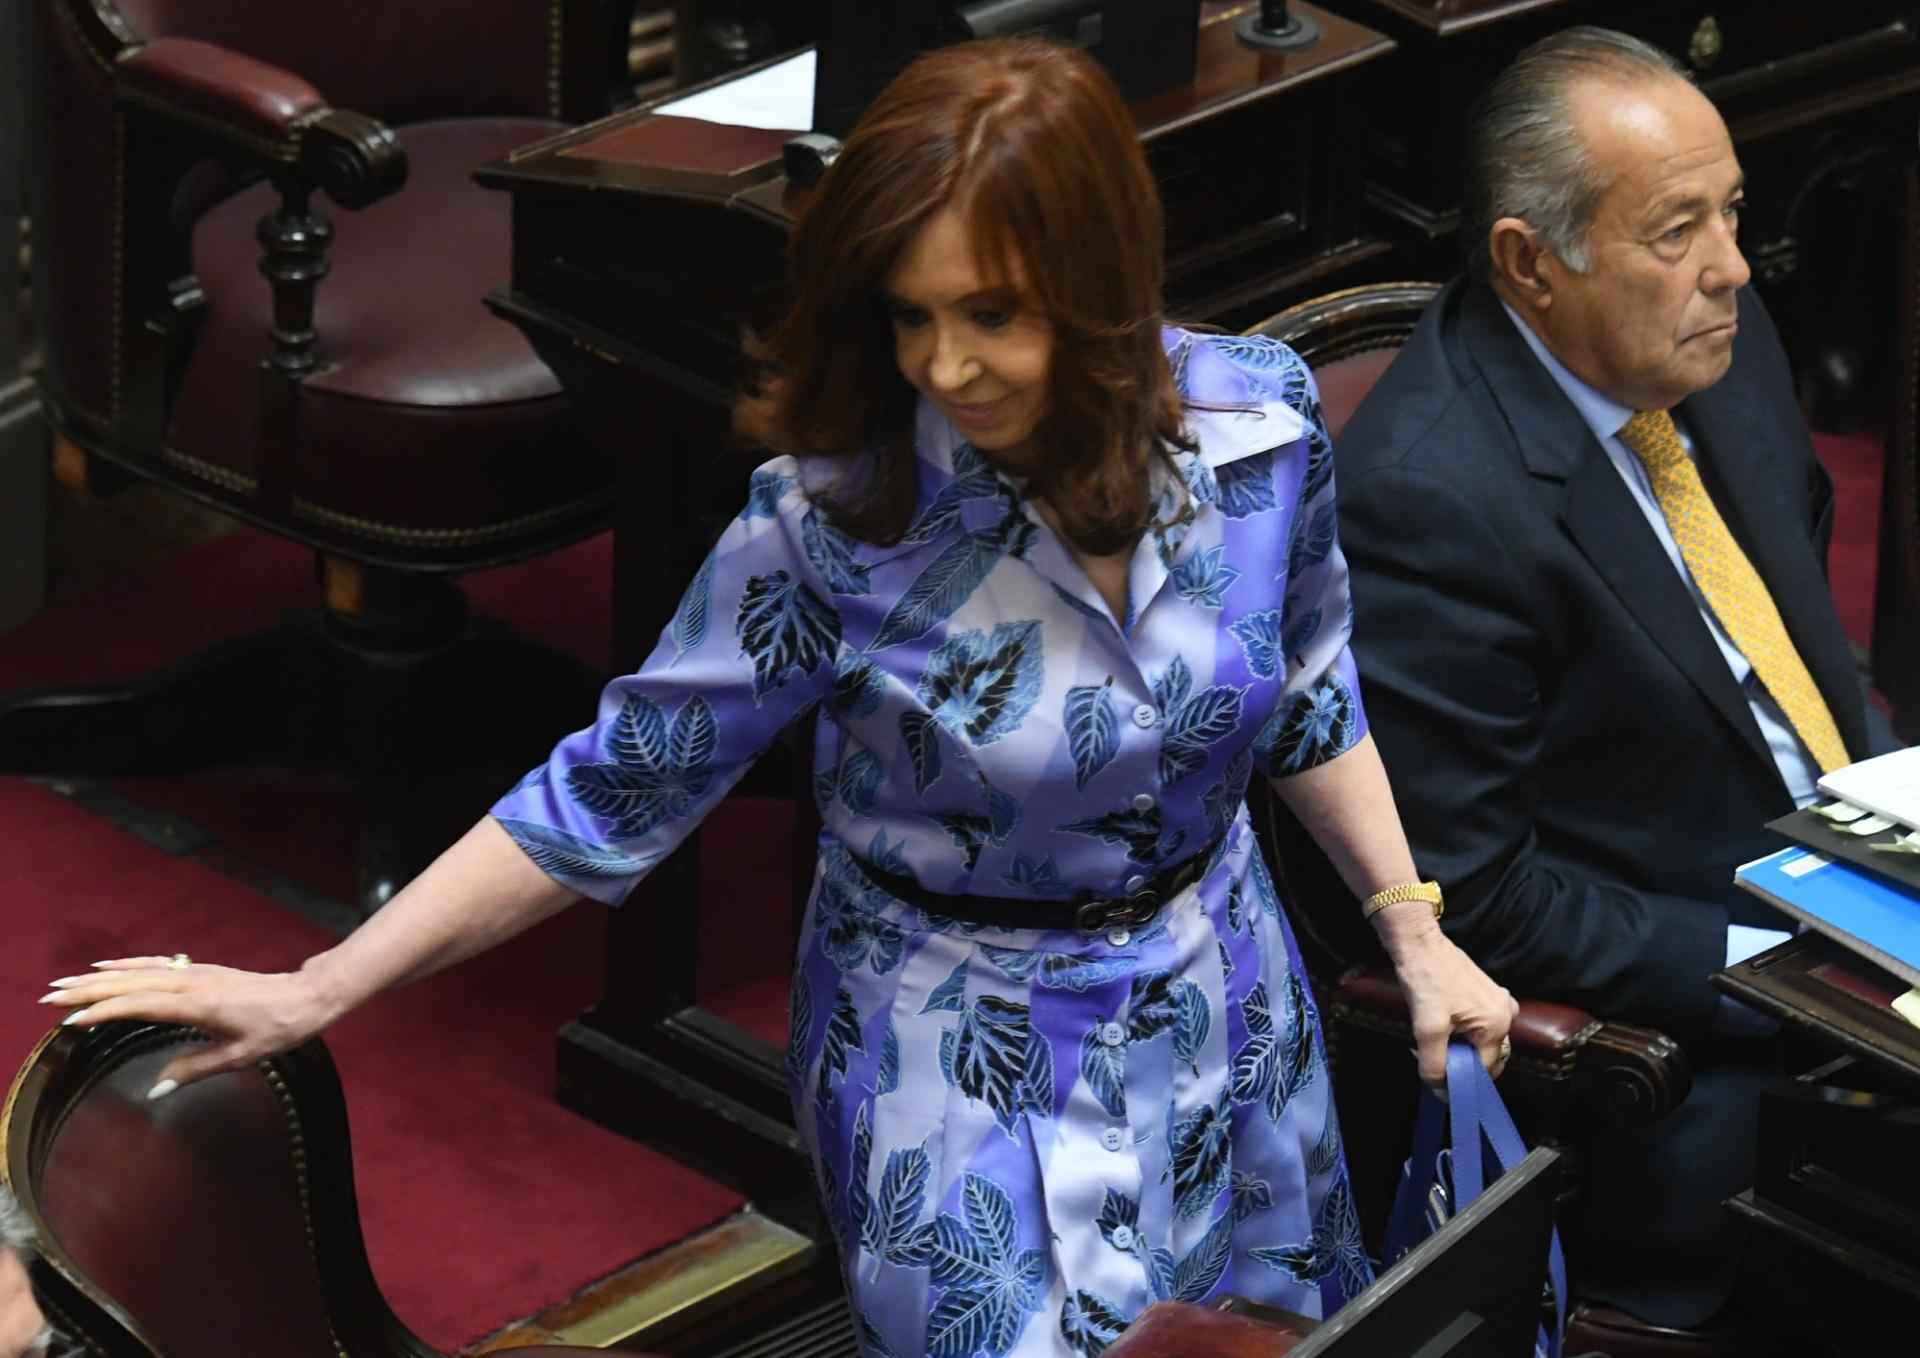 La ex presidente y actual senadora Cristina Kirchner (Maximiliano Luna)